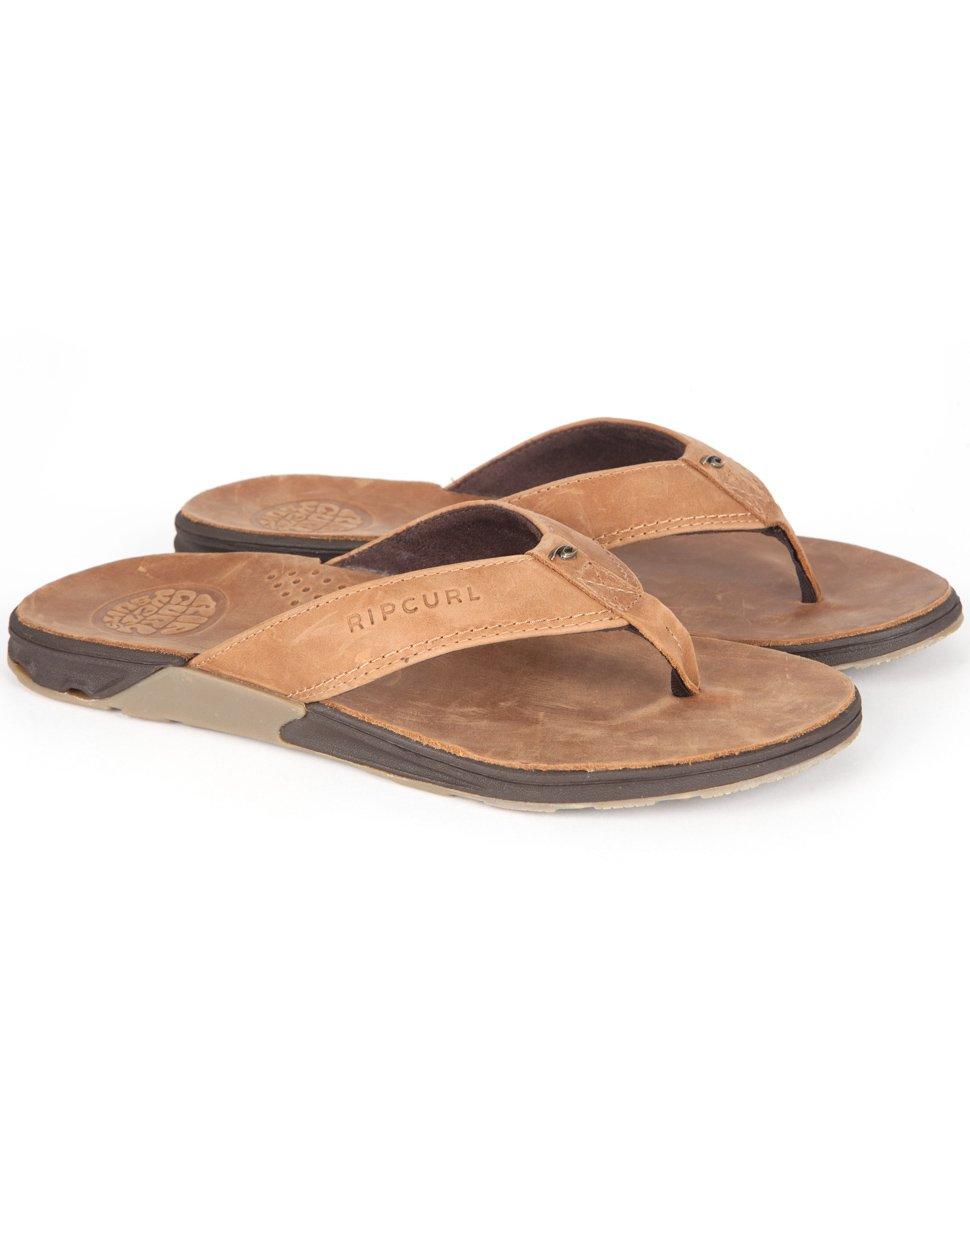 Rip Curl Ultimate Leather Sandal Tan